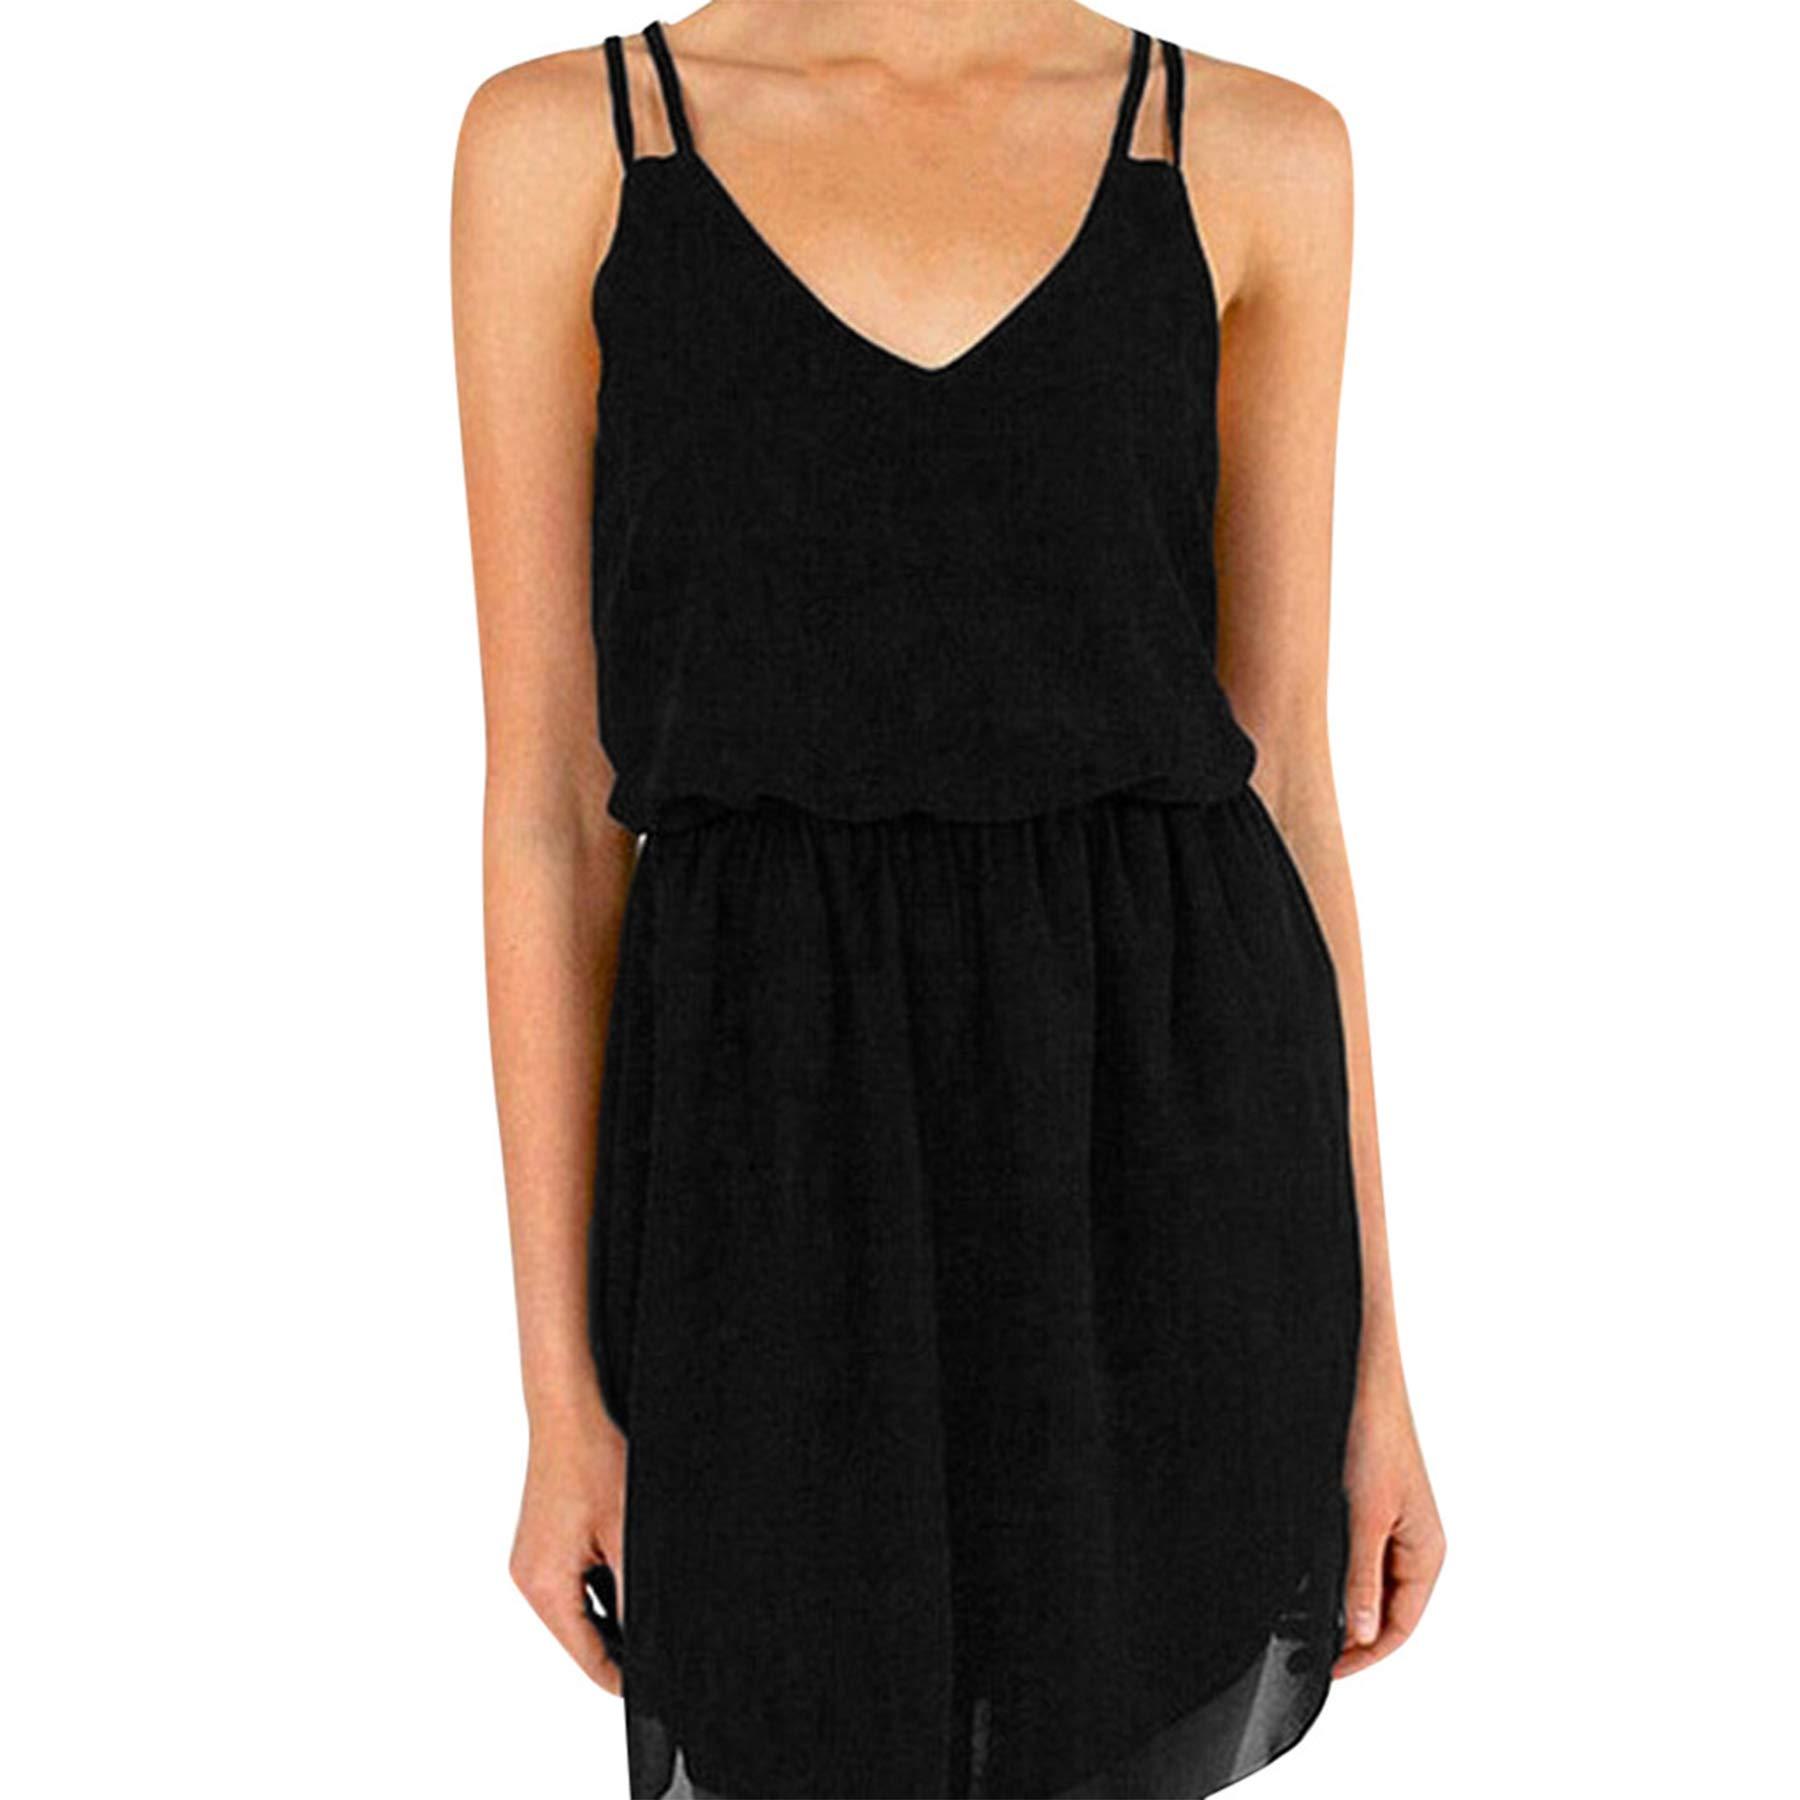 Women's Summer Sexy Chiffon Sleeveless Sling Dresses Casual V Neck Cocktail Party Mini T Shirt Dresses